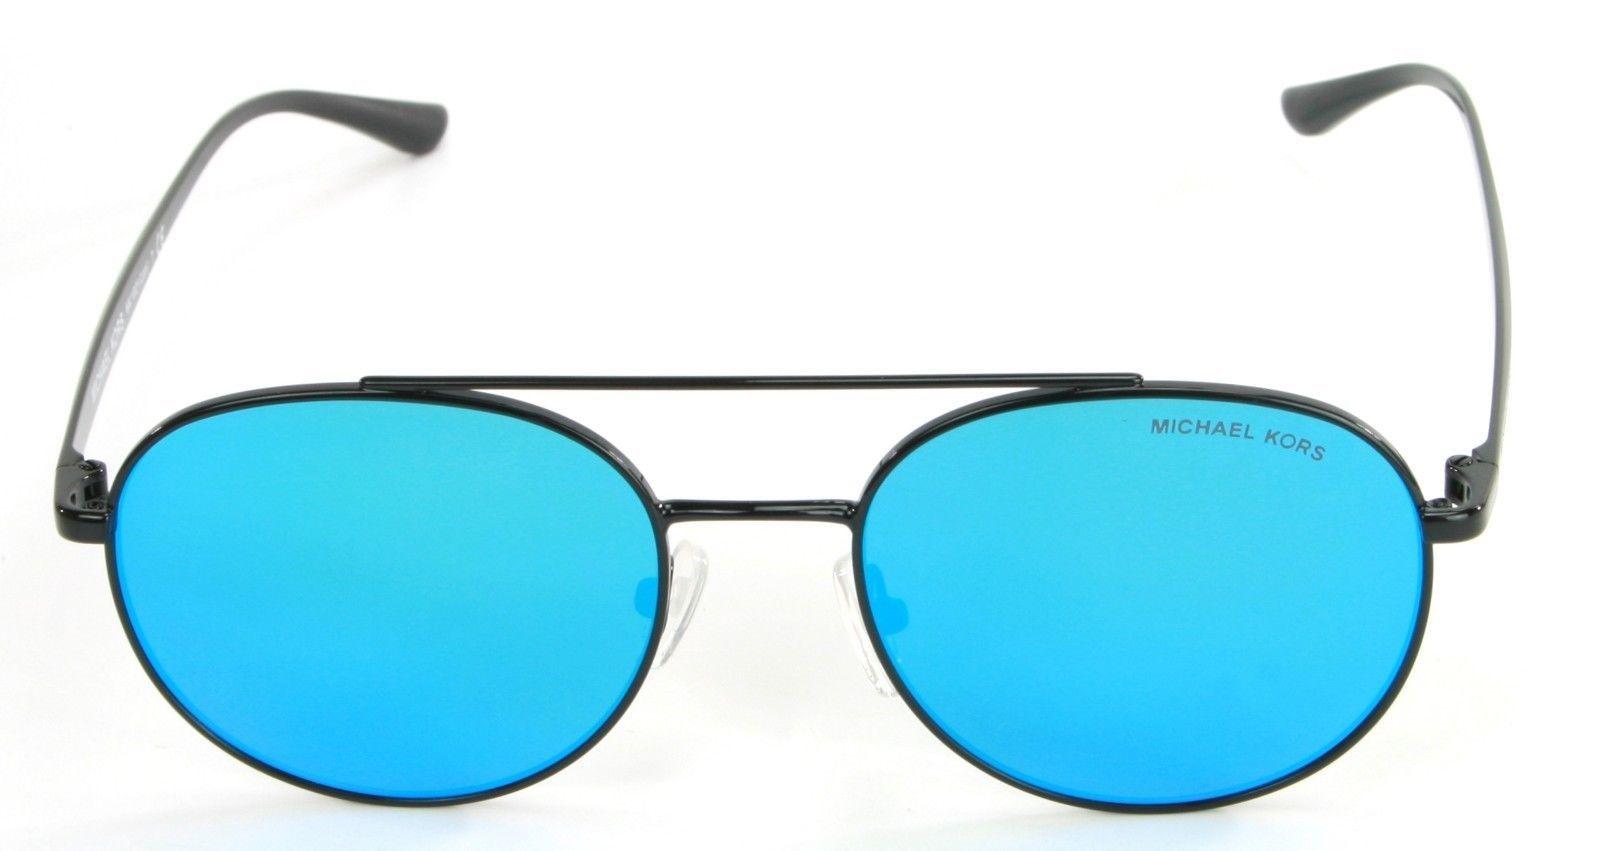 117974580 Michael Kors Lon Aviator Blue Mirror Lens and similar items. 57